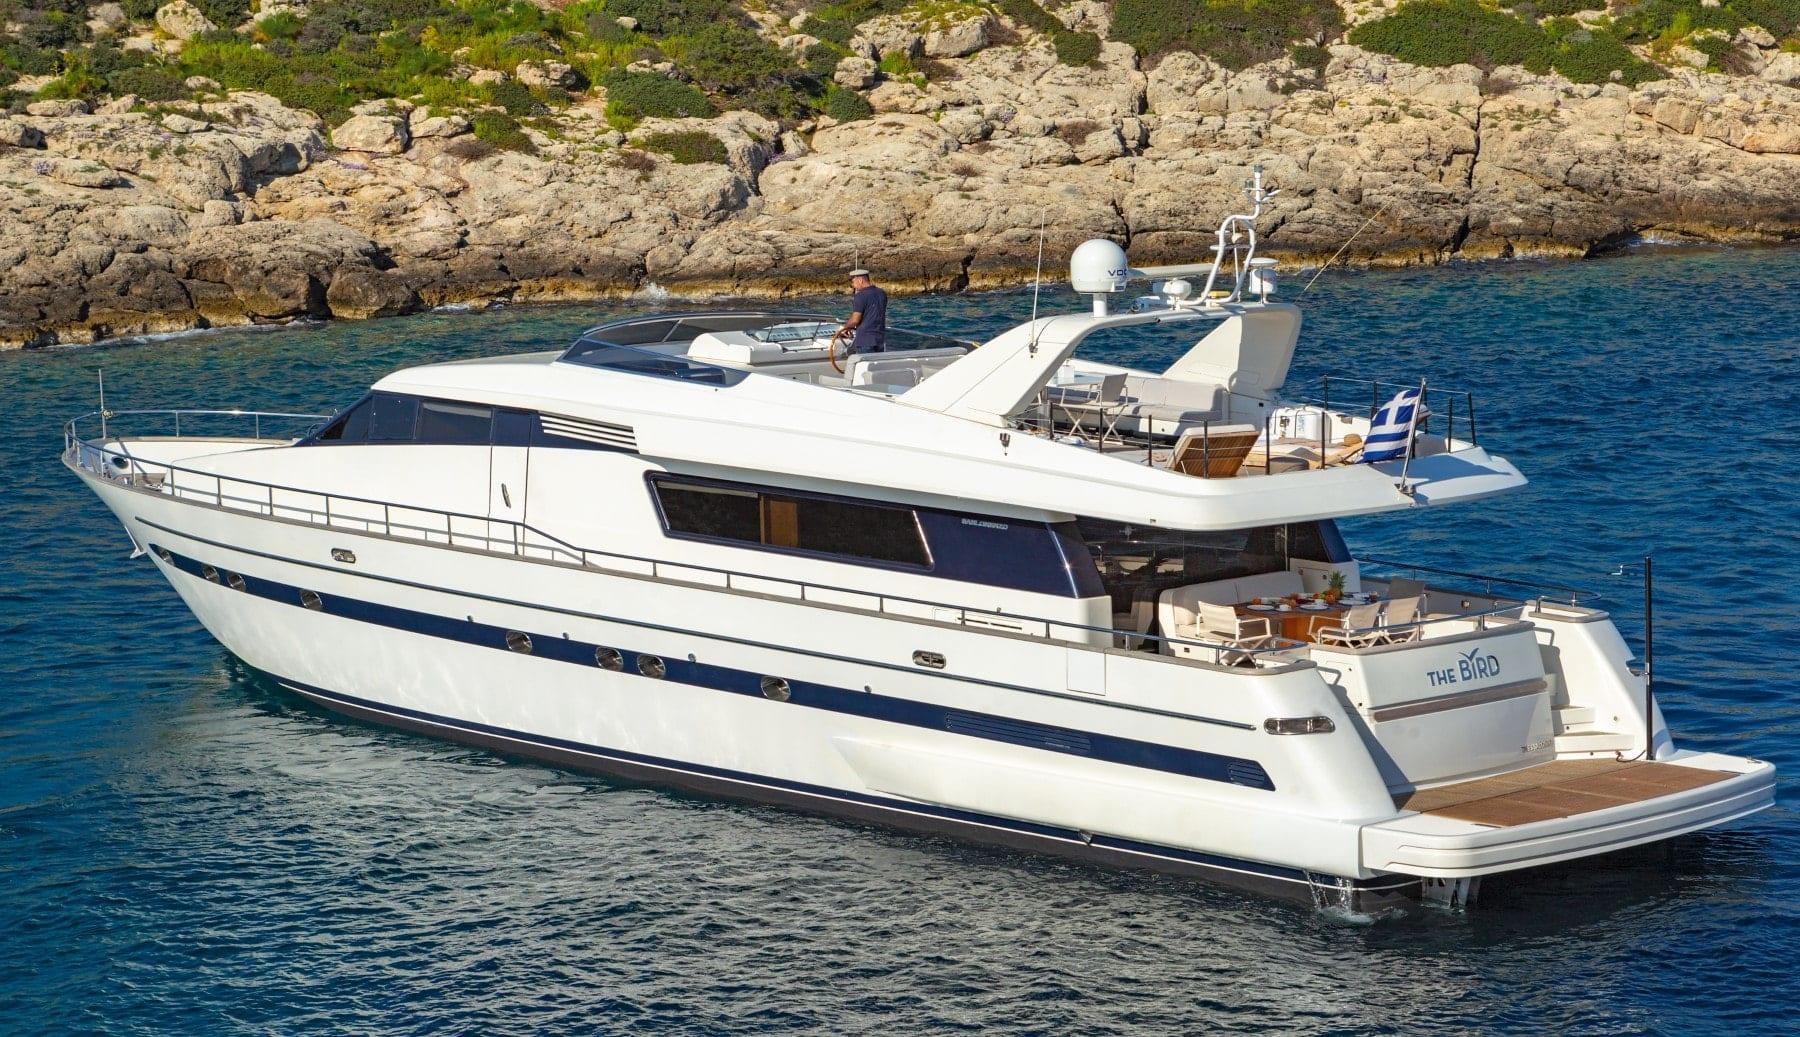 the bird motor yacht exterior profiles (1) min - Valef Yachts Chartering